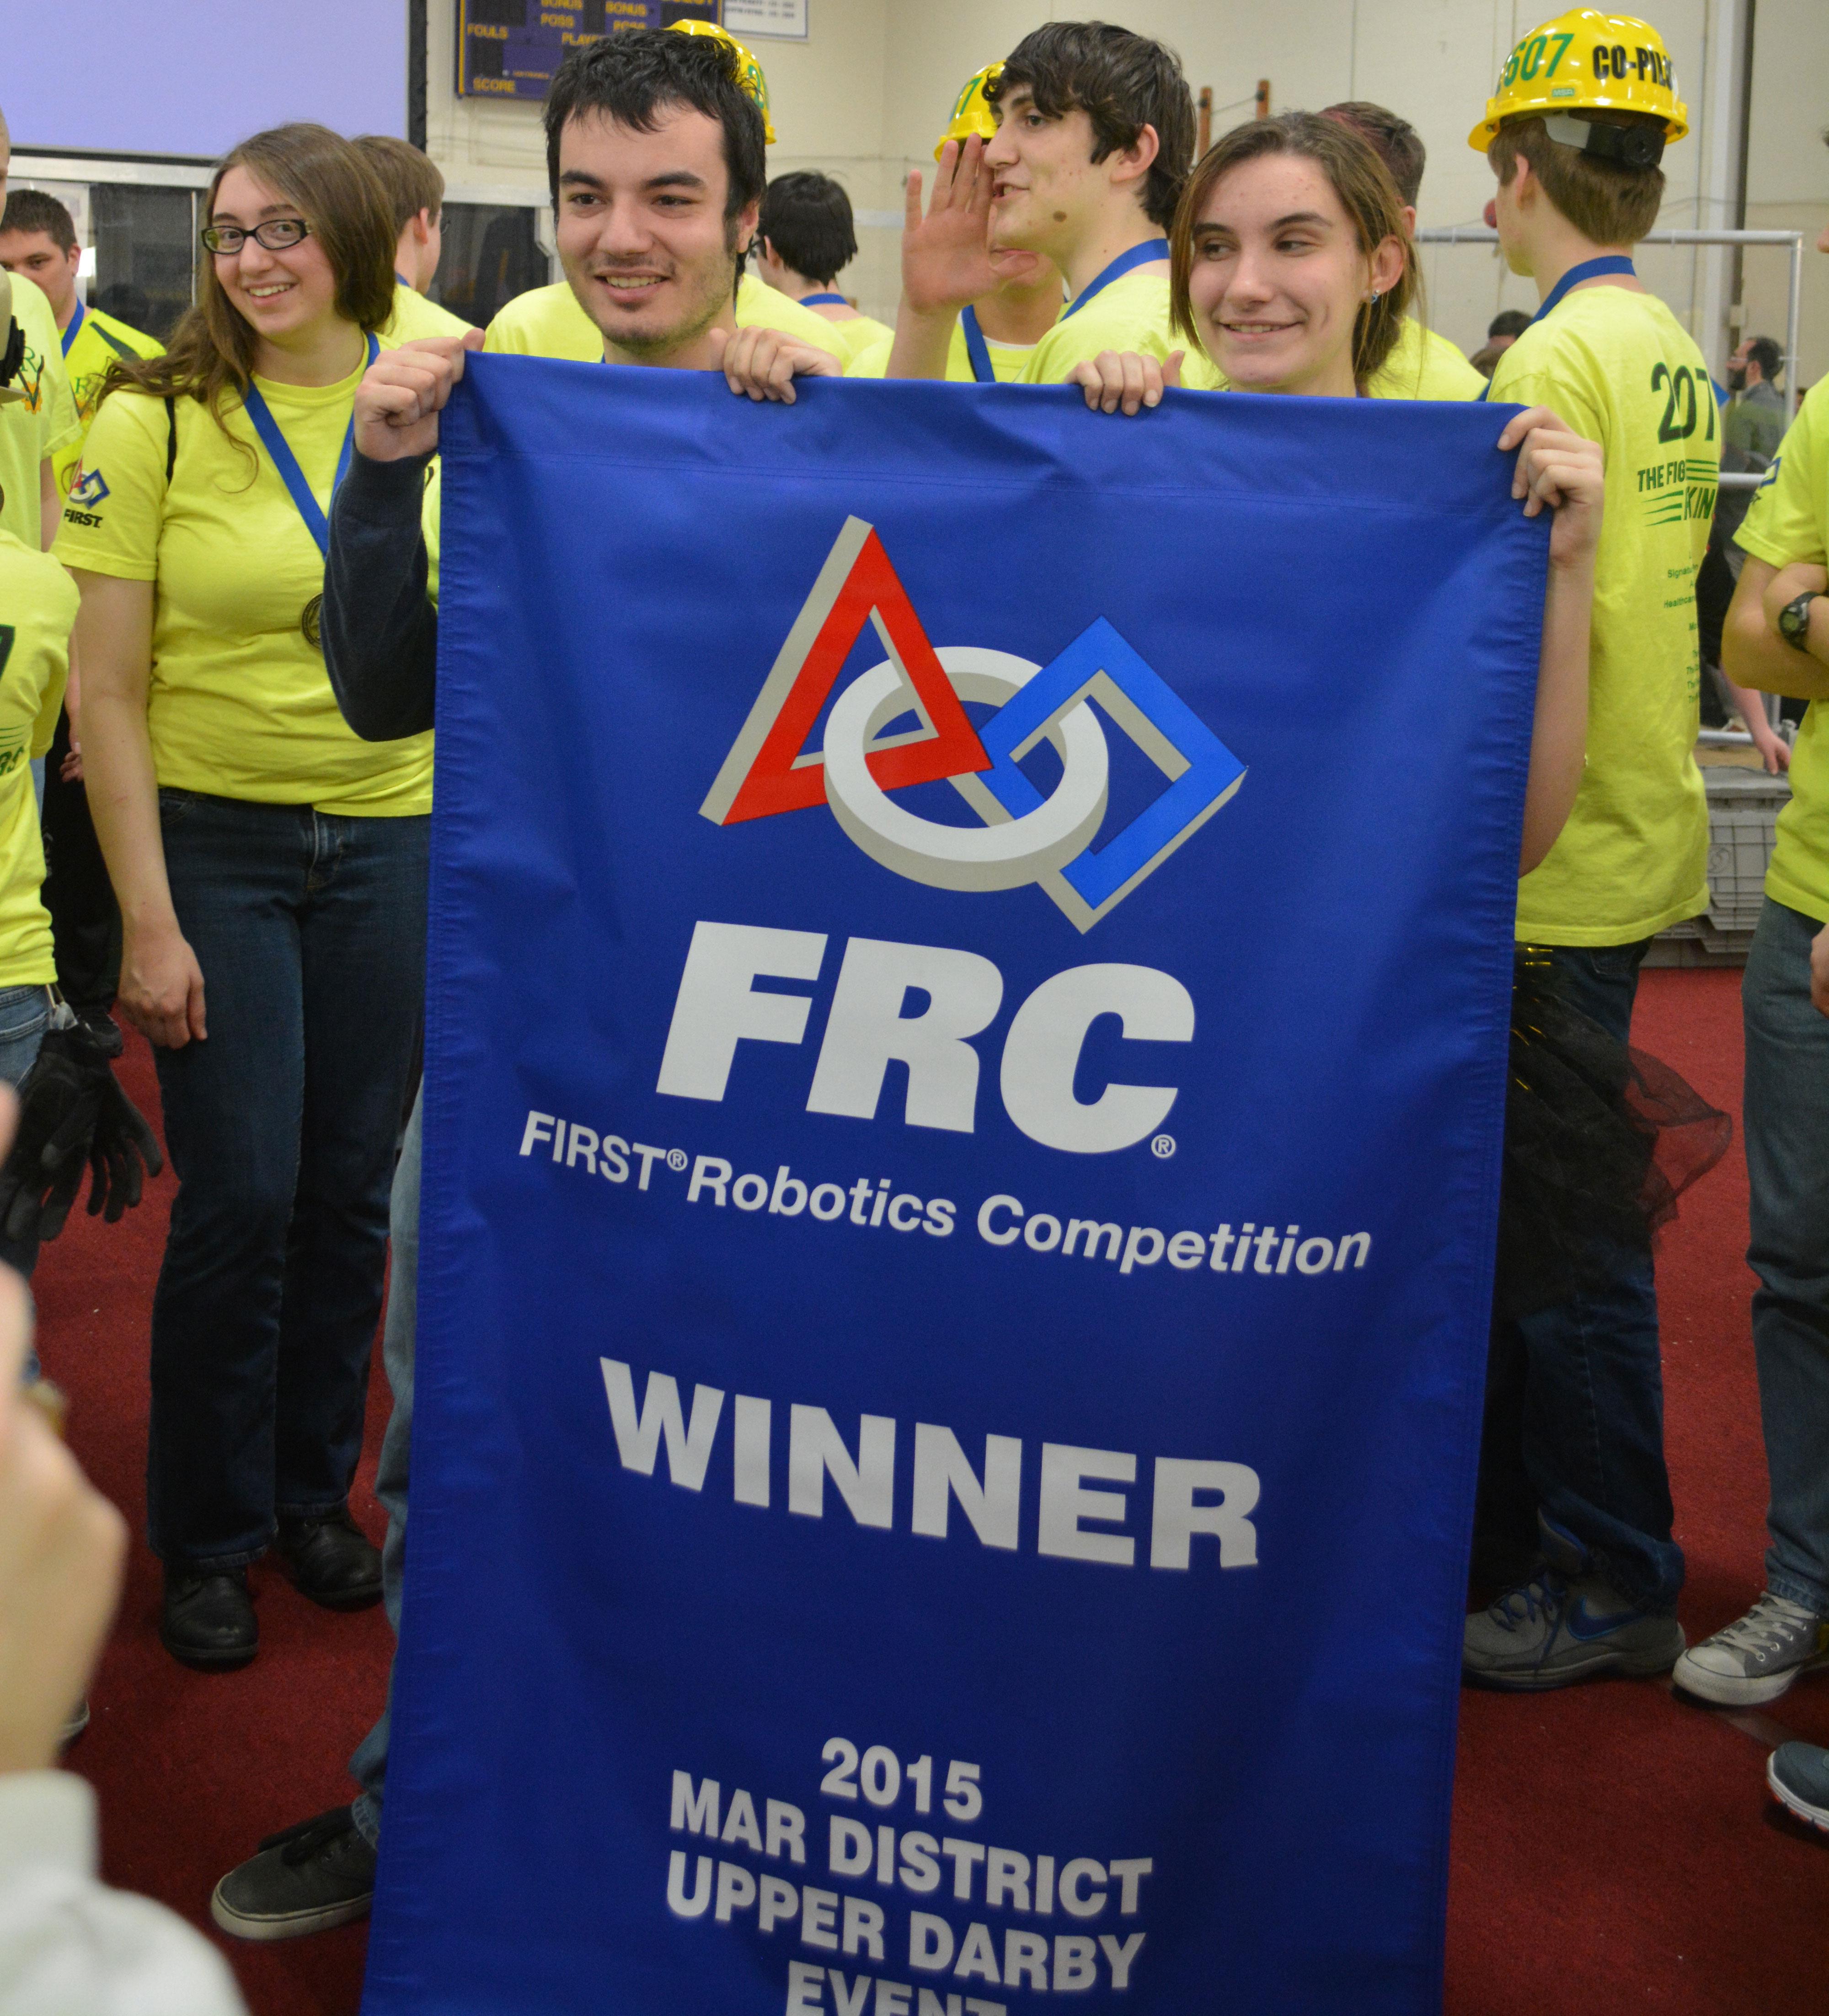 2015 MAR Upper Darby District Winner